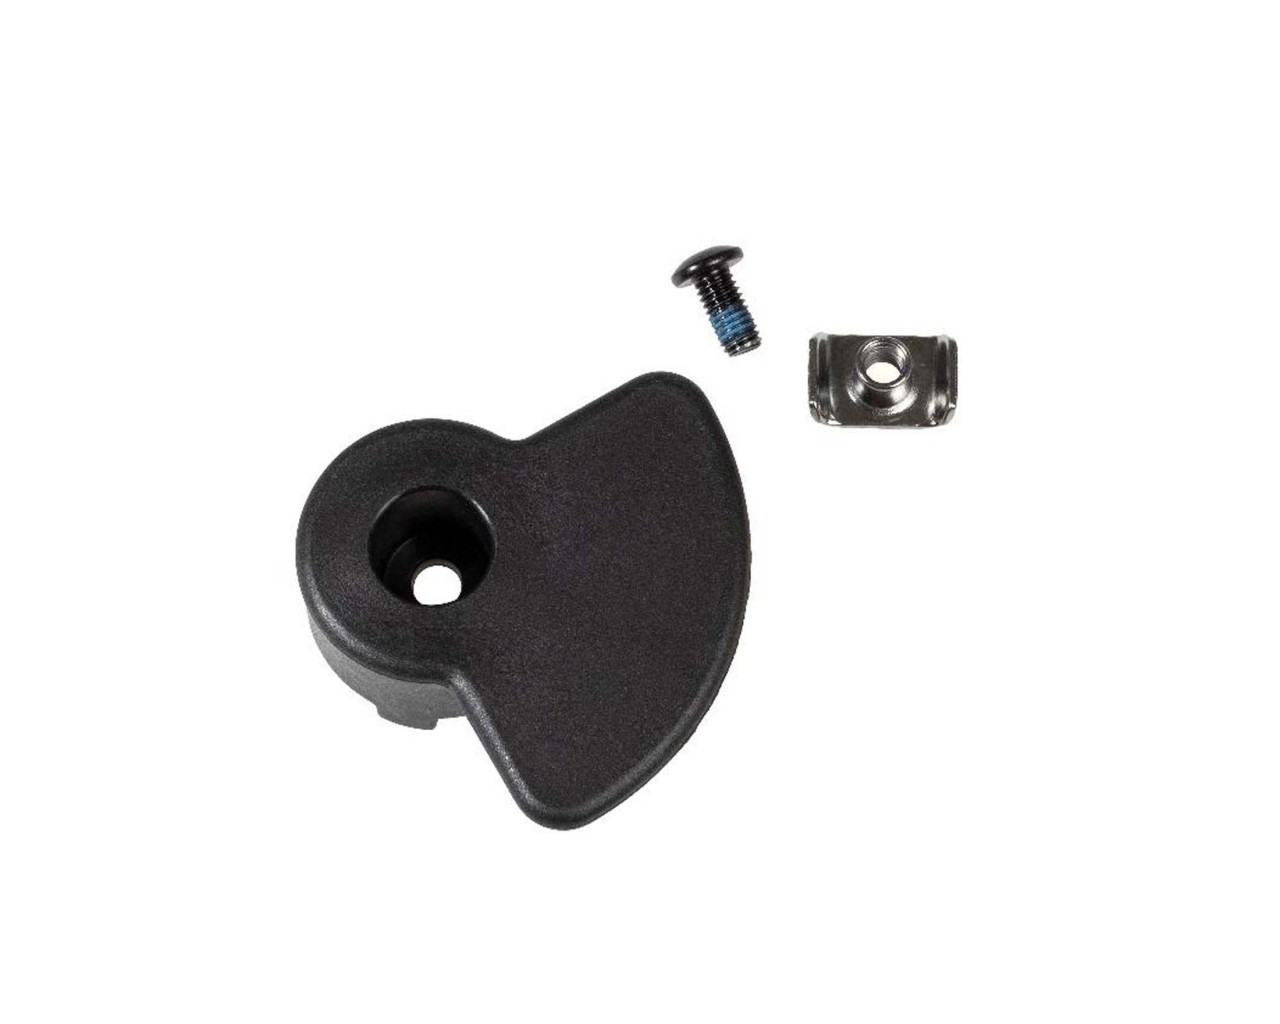 Ortlieb QL1 Anchoring Hook 16mm